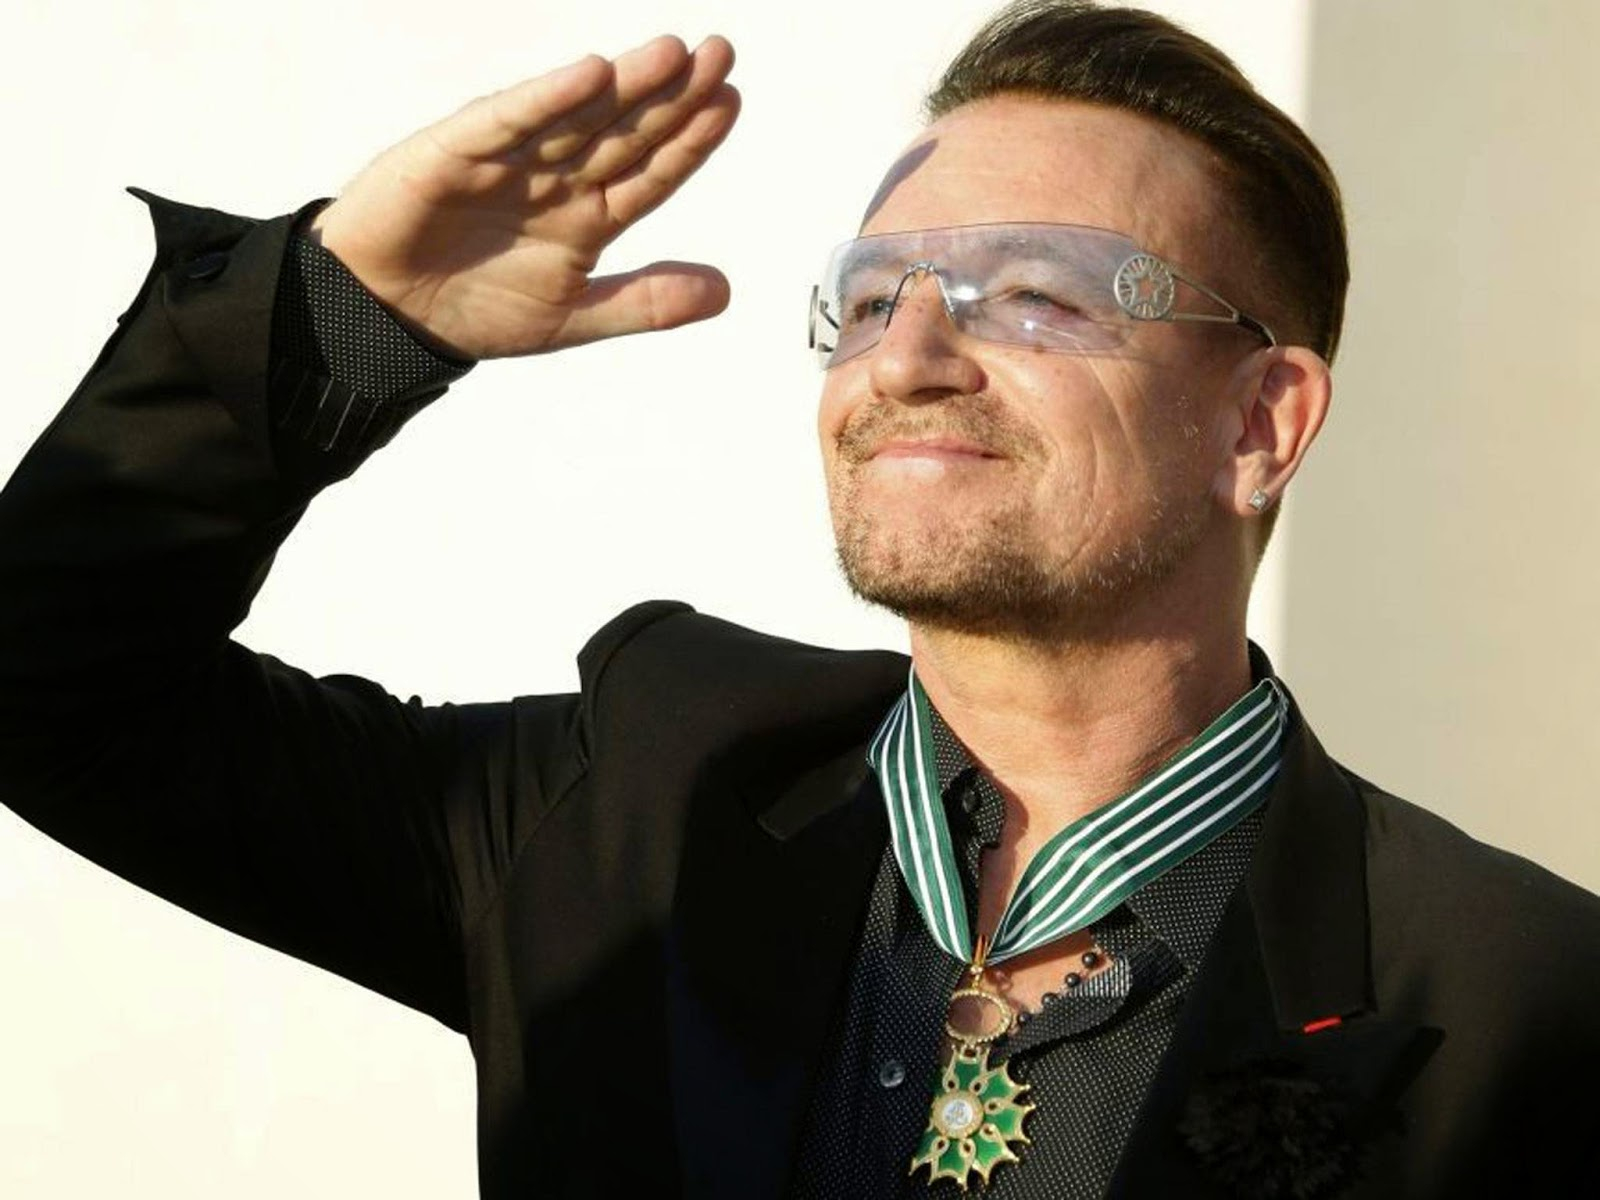 "<img src=""http://2.bp.blogspot.com/-kqCb9x89Xw4/U9_v8G6KydI/AAAAAAAAAcc/DJOca9tv3ak/s1600/bono-.jpg"" alt=""Richest Musicians in the World"" />"